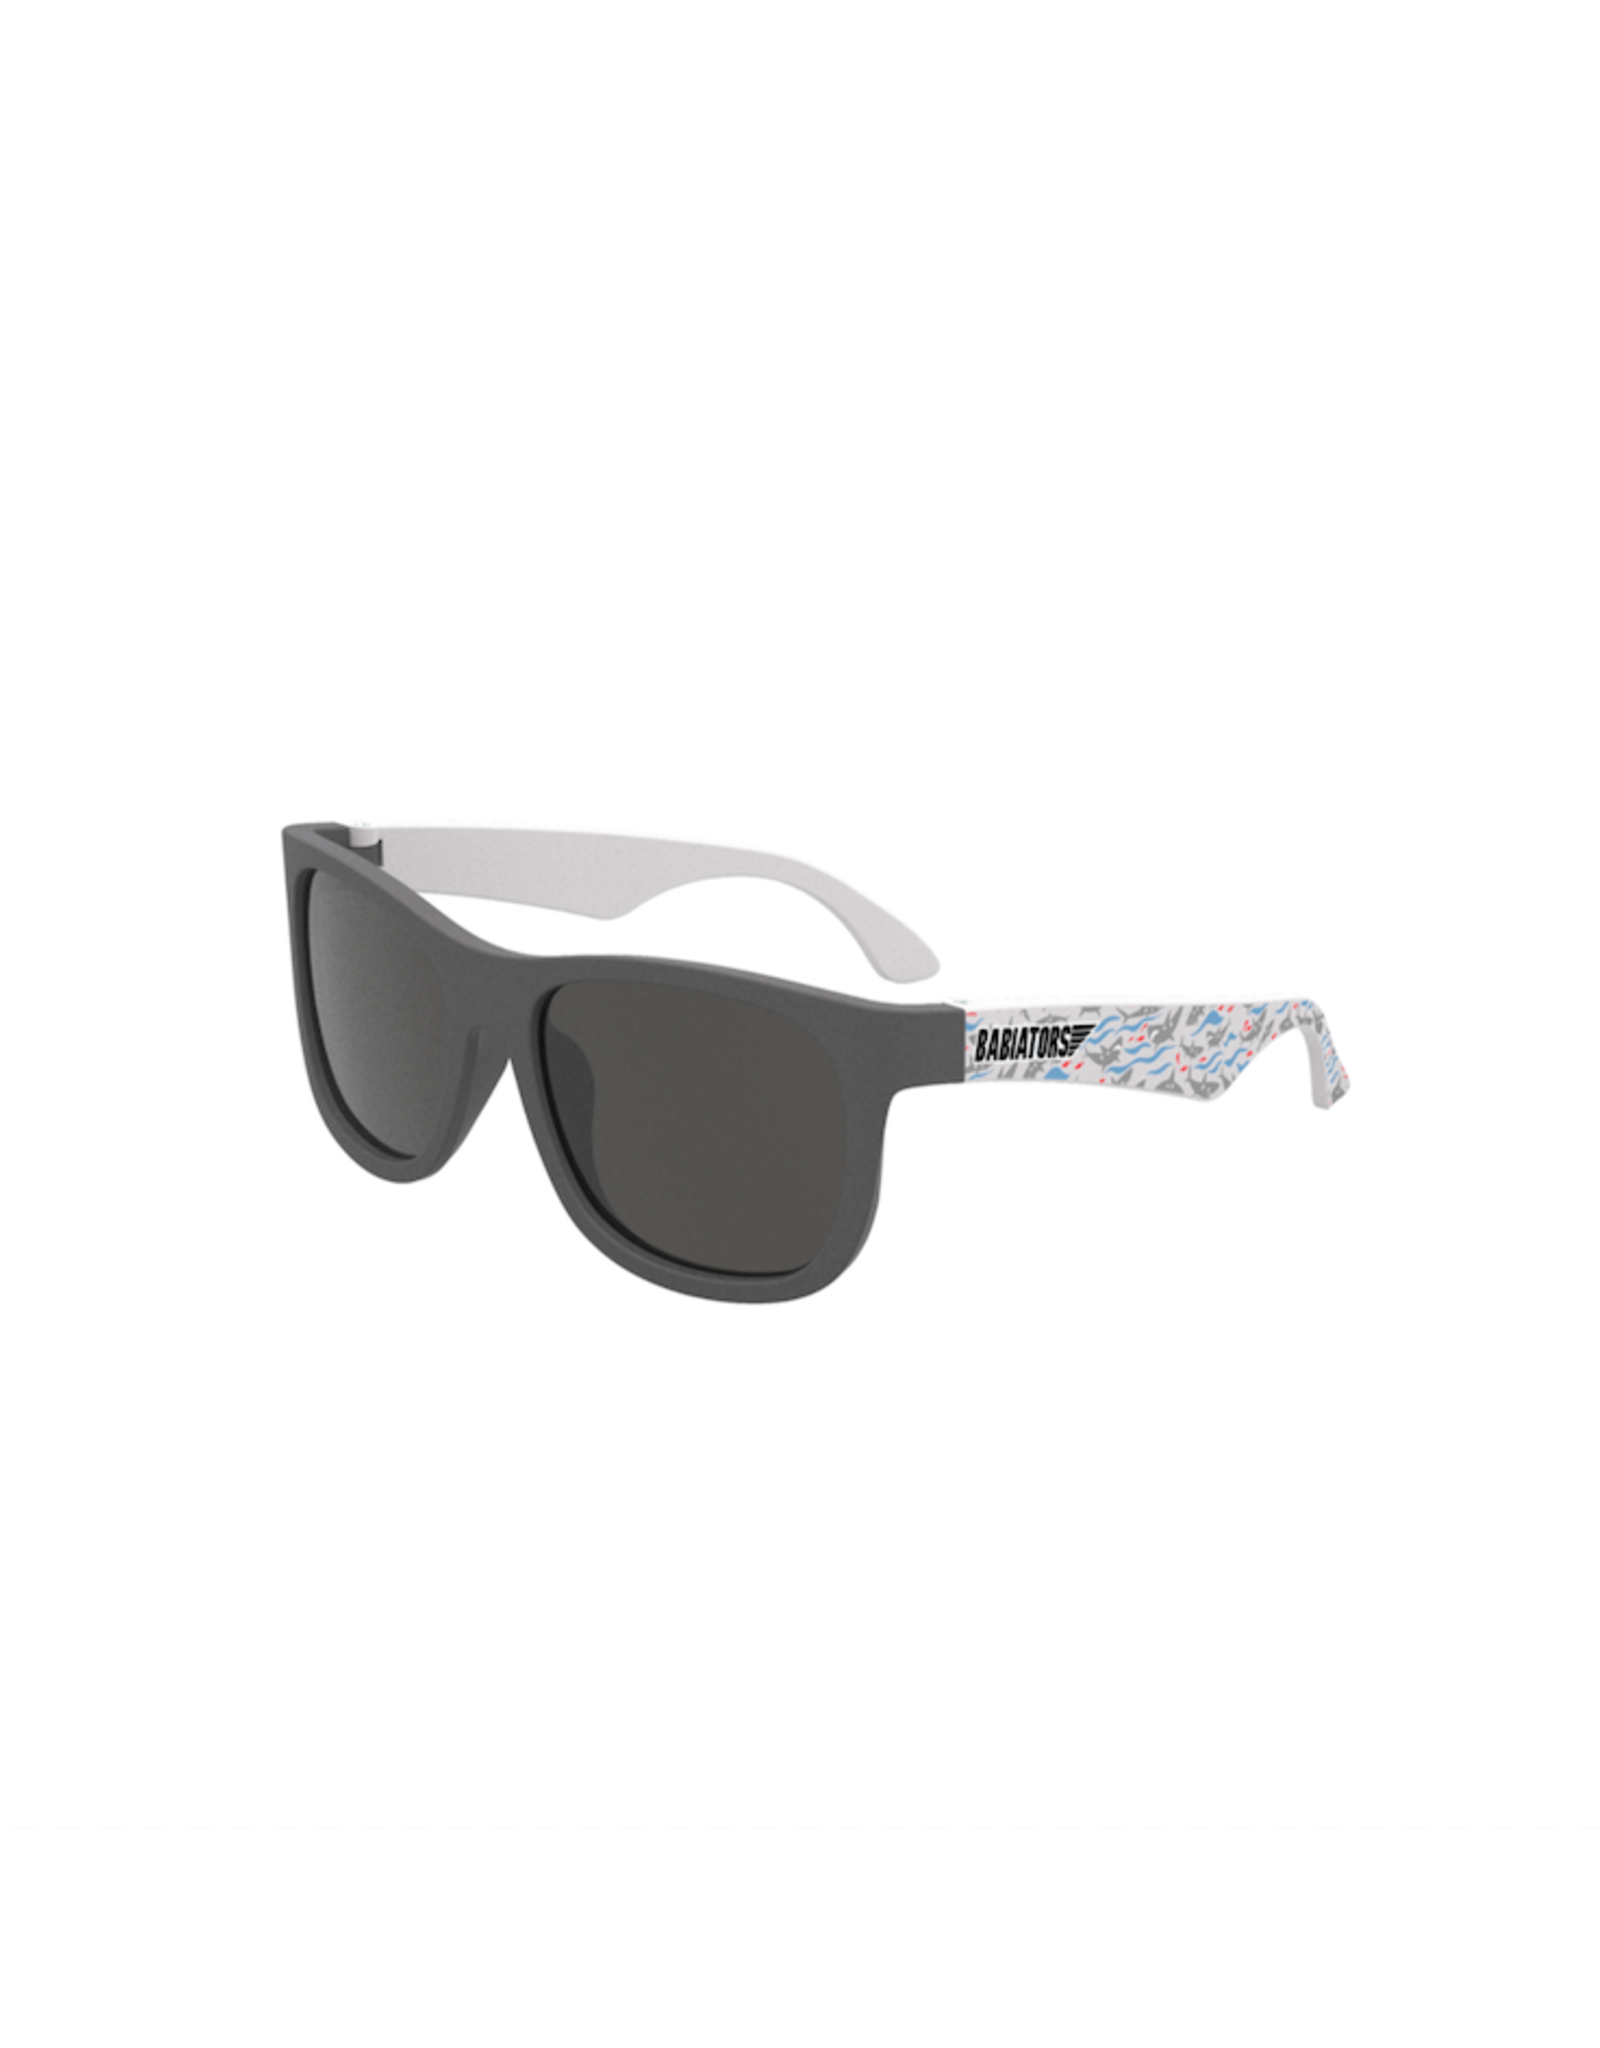 Babiators Limited Edition, Navigator, Sunglasses, Shark Tastic Grey